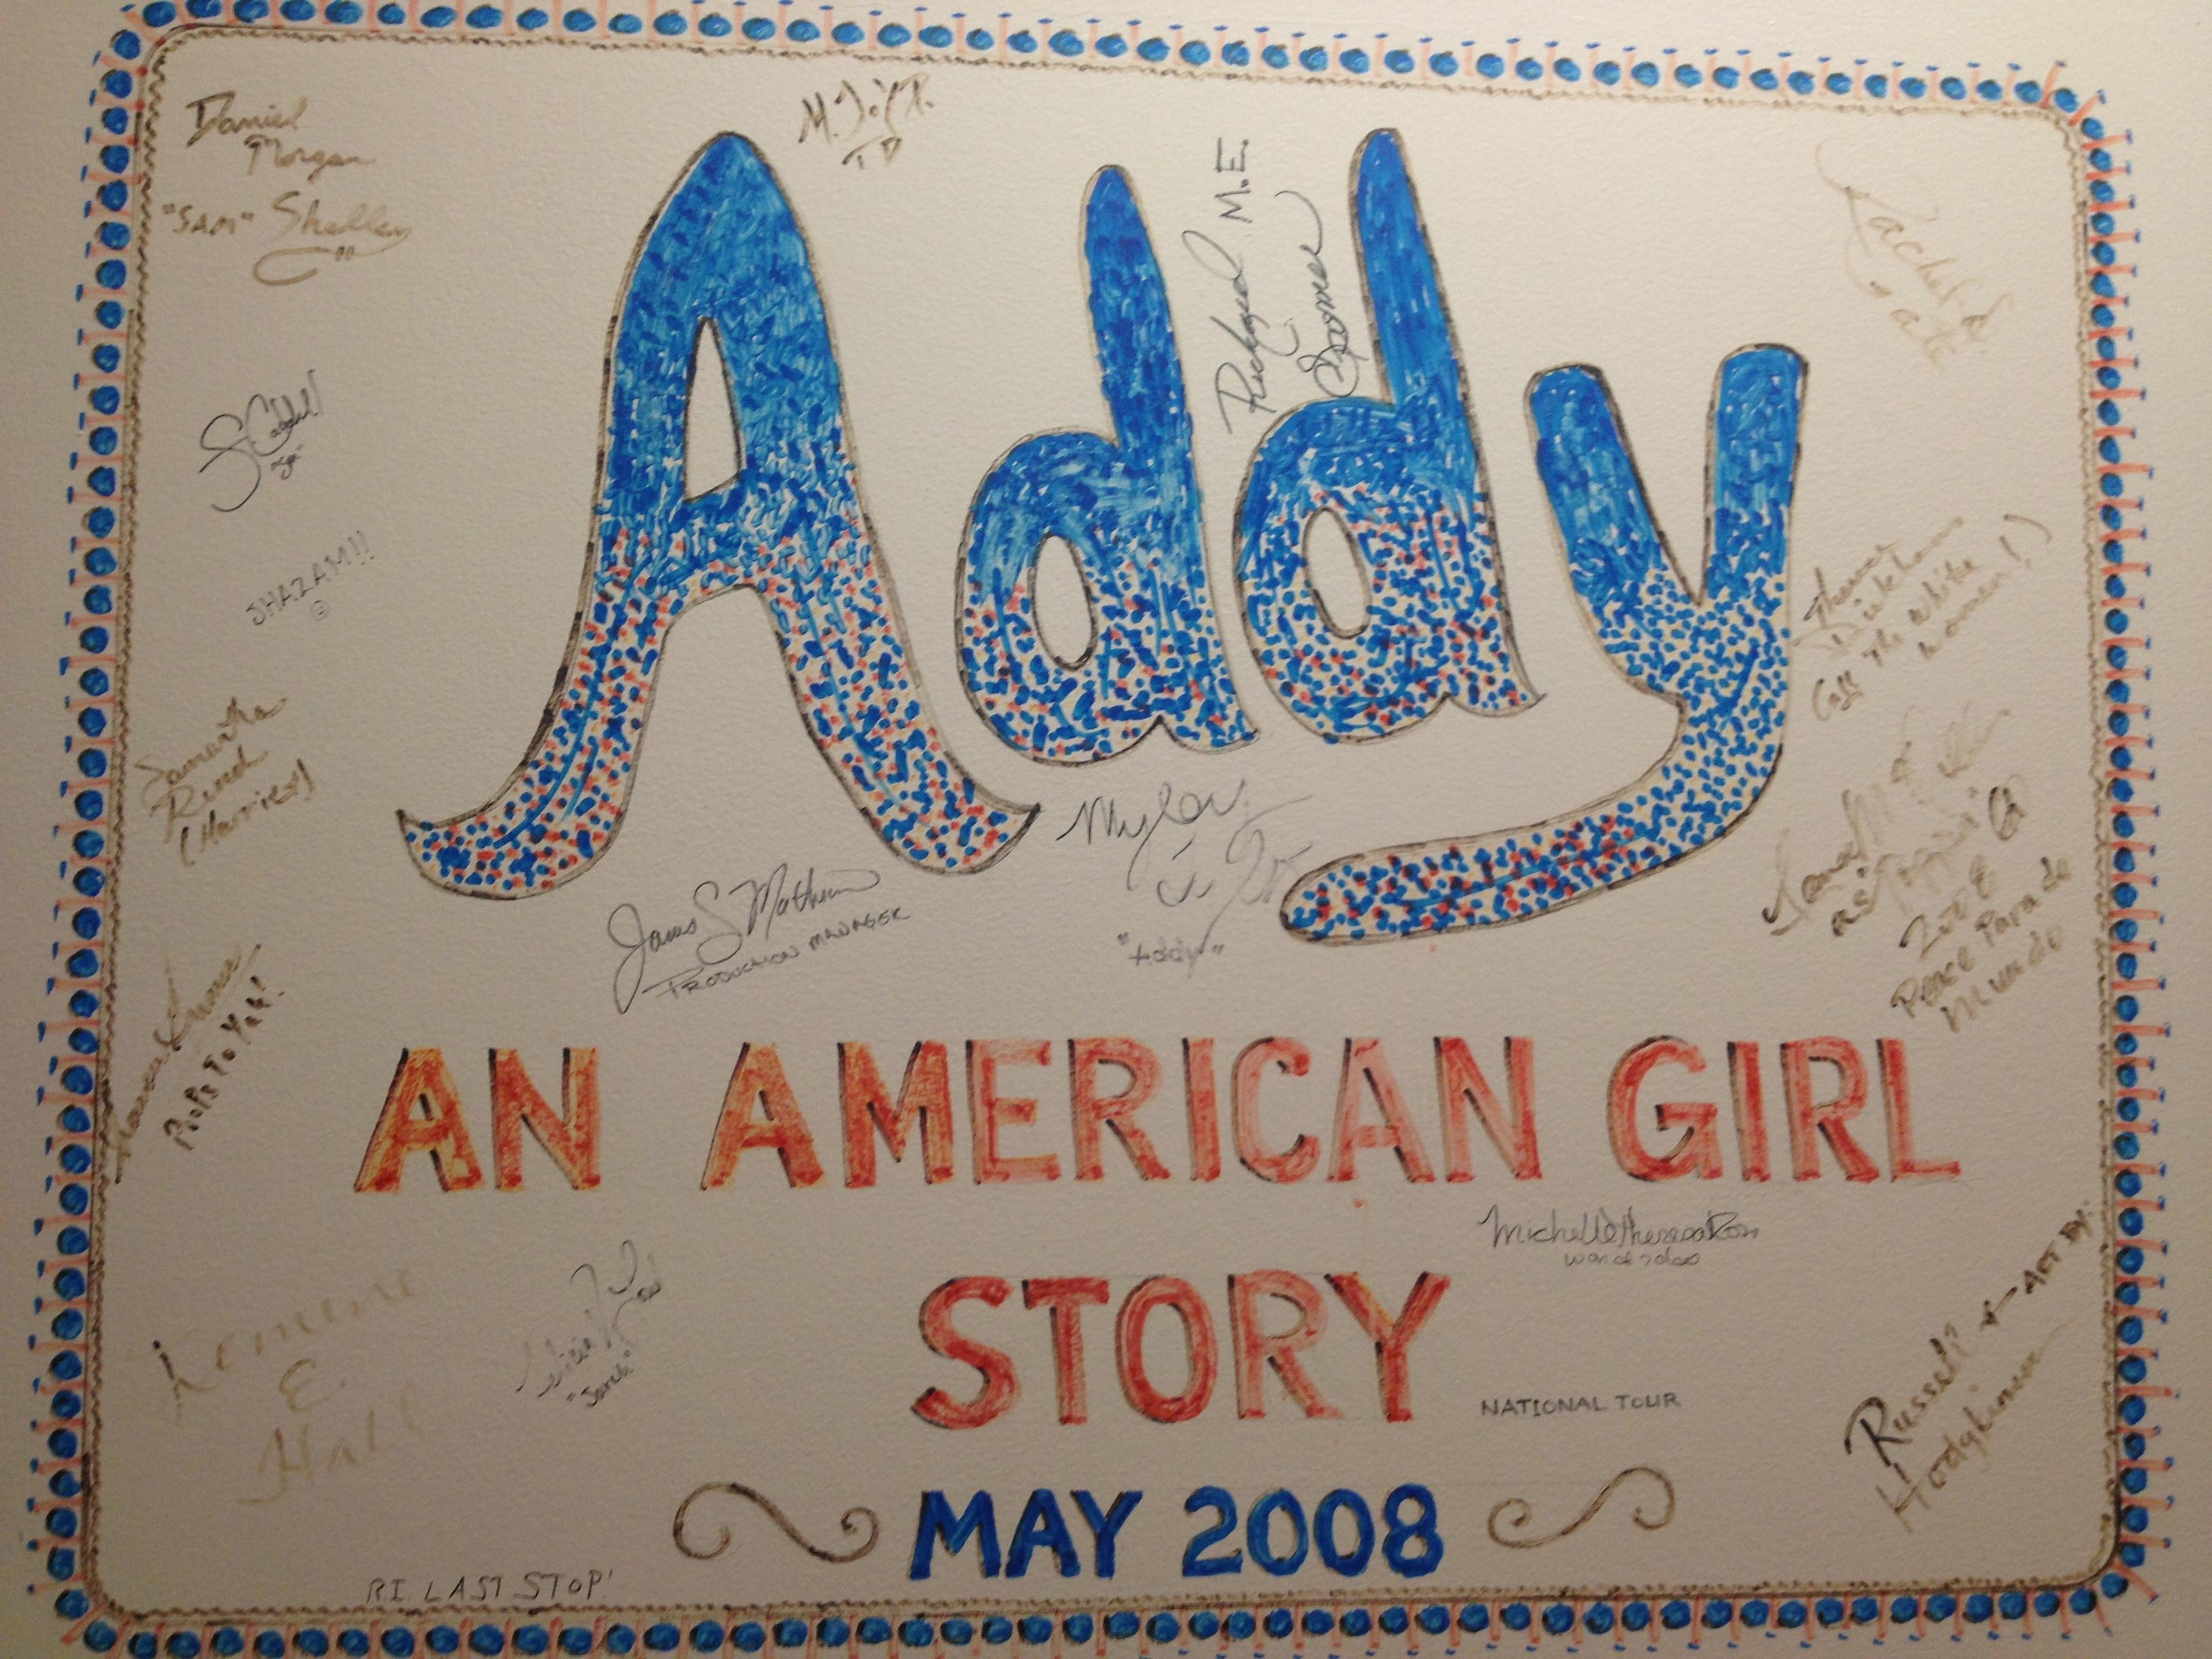 Addy An American Girl Story.jpg